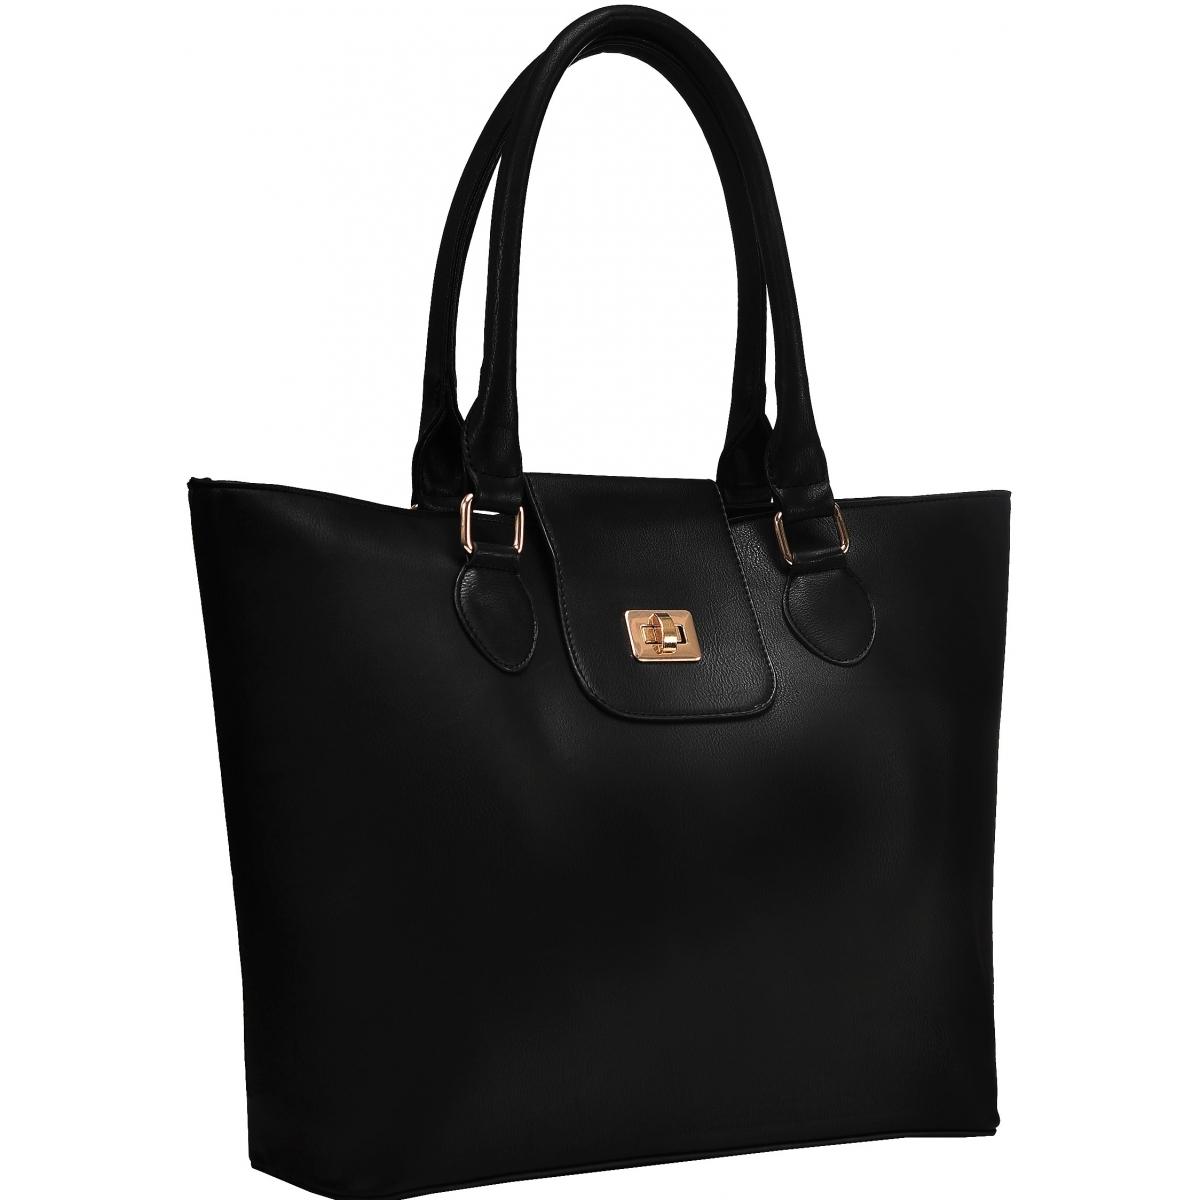 sac main shopping krlot taille l fkg0300 couleur principale black promotion. Black Bedroom Furniture Sets. Home Design Ideas